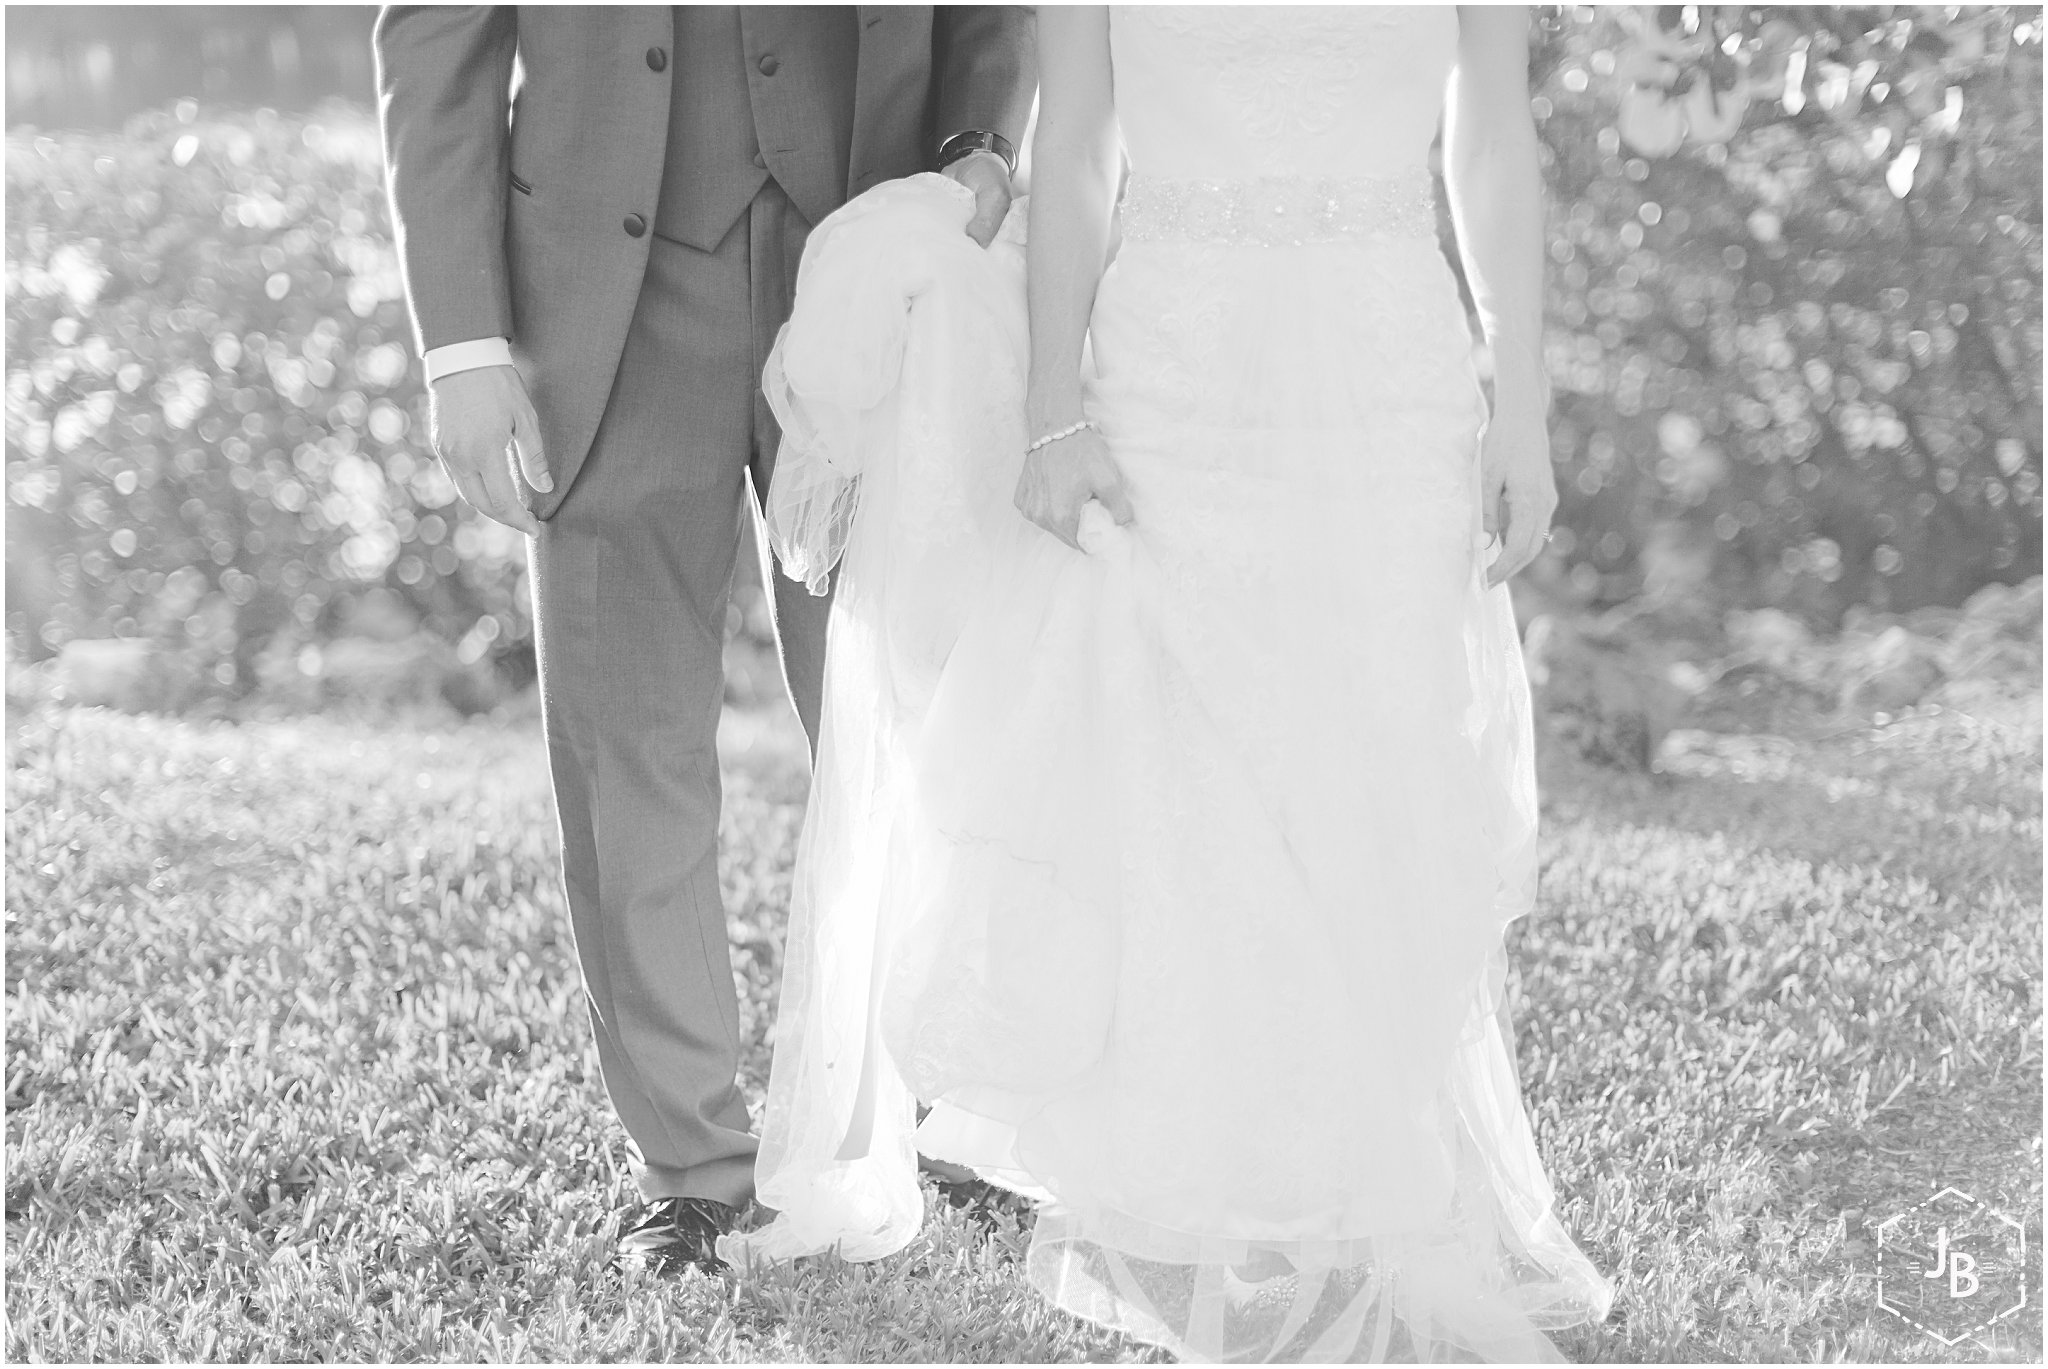 WeddingandEngagementFloridaPhotographer_0371.jpg